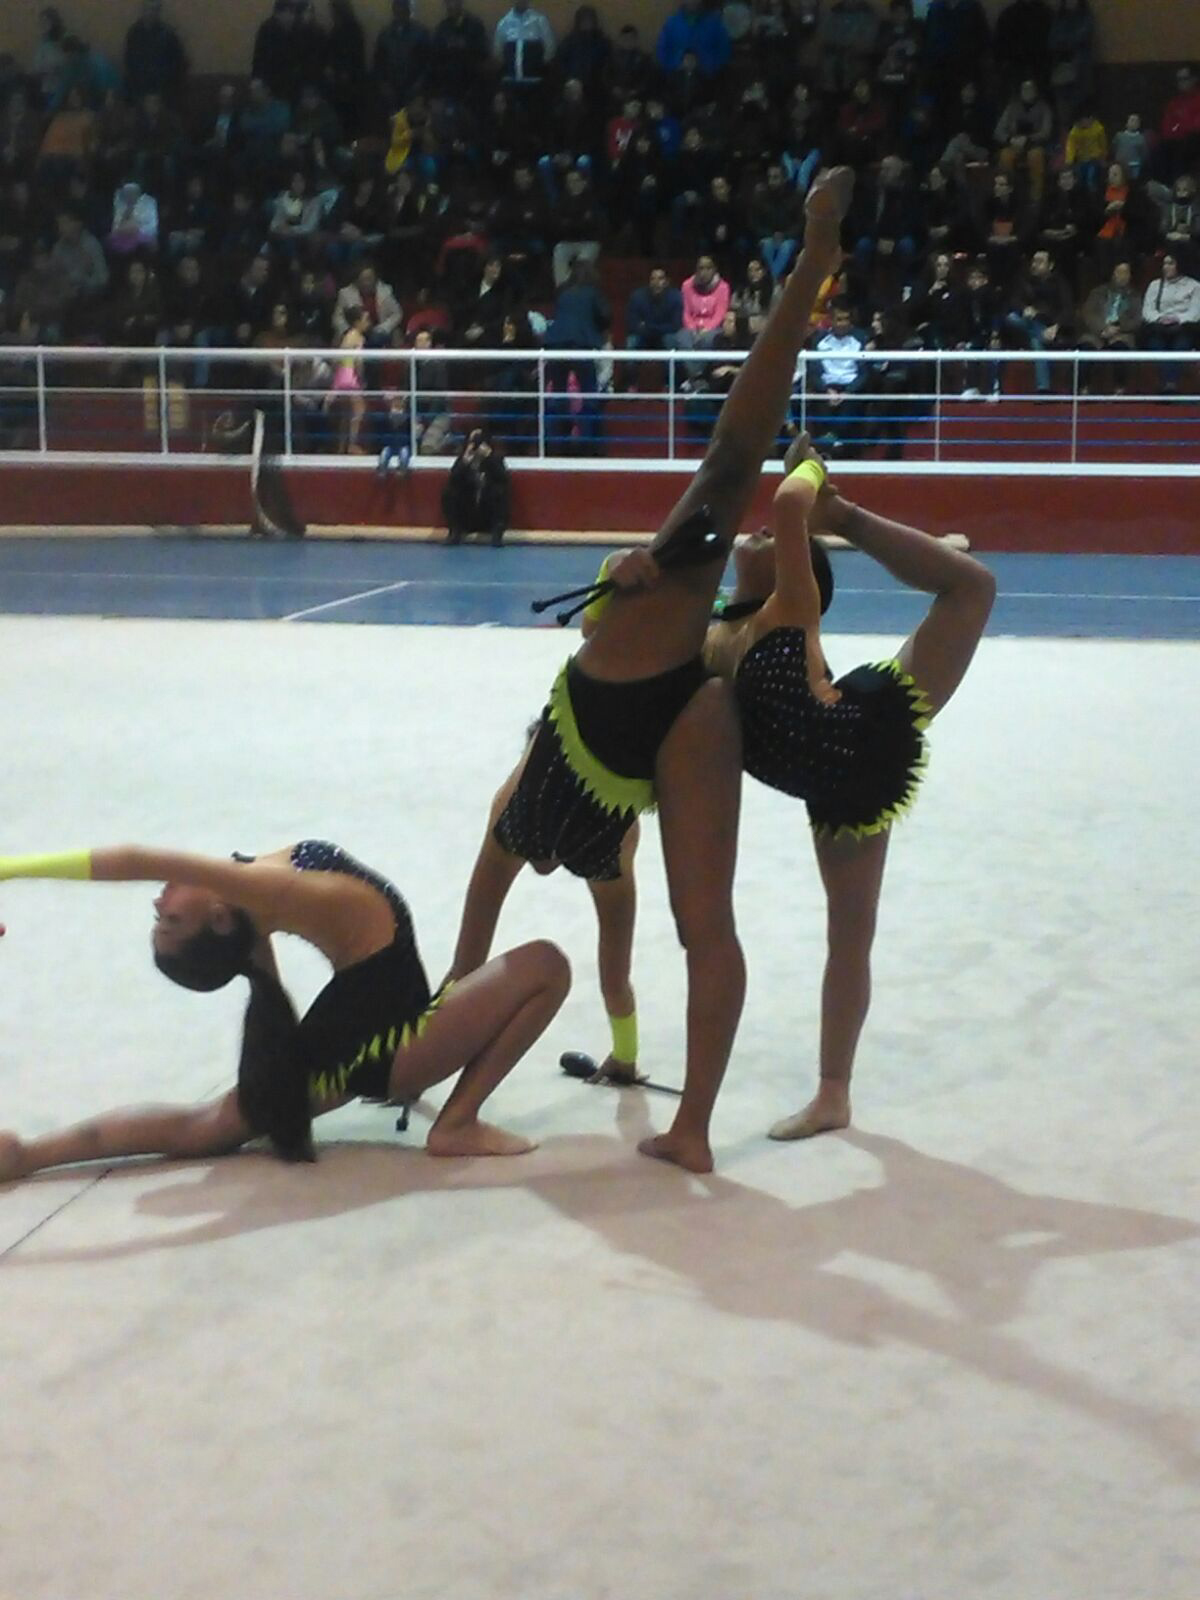 competicion gimnasia ritmica poniente 3